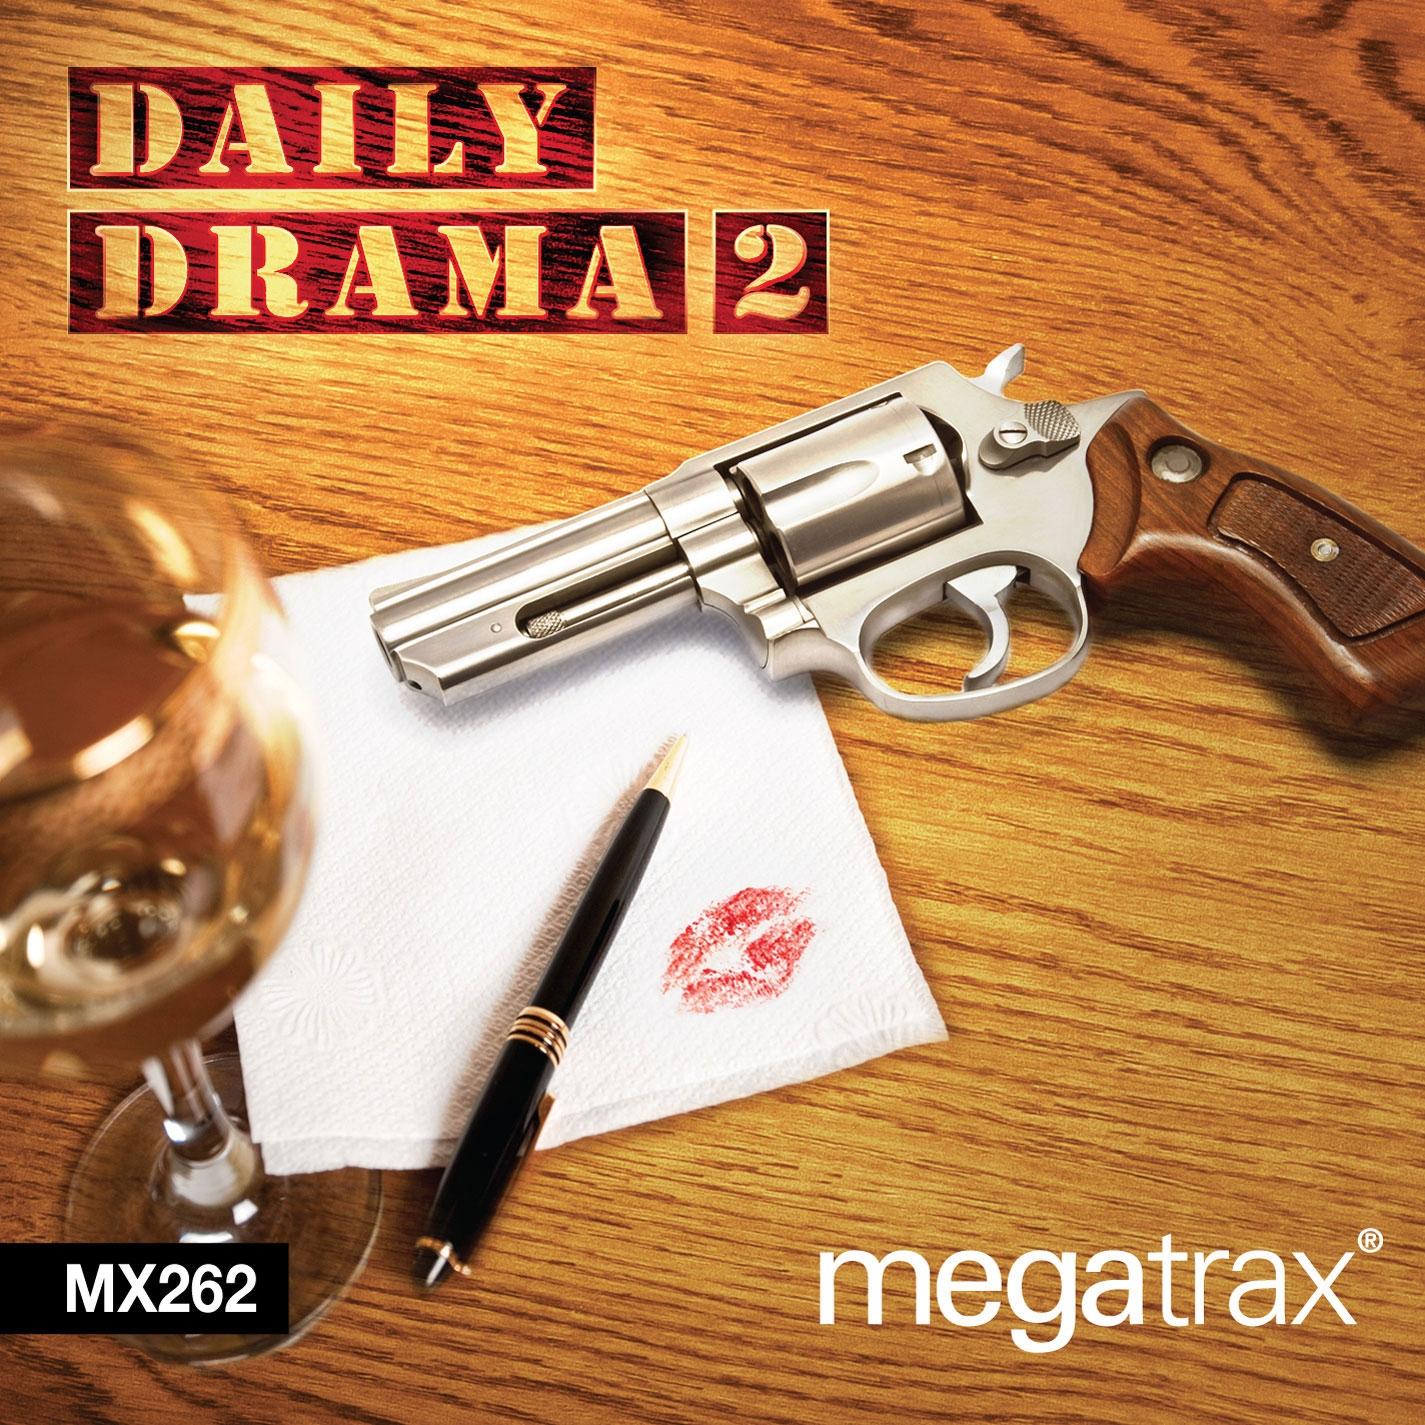 Daily Drama 2